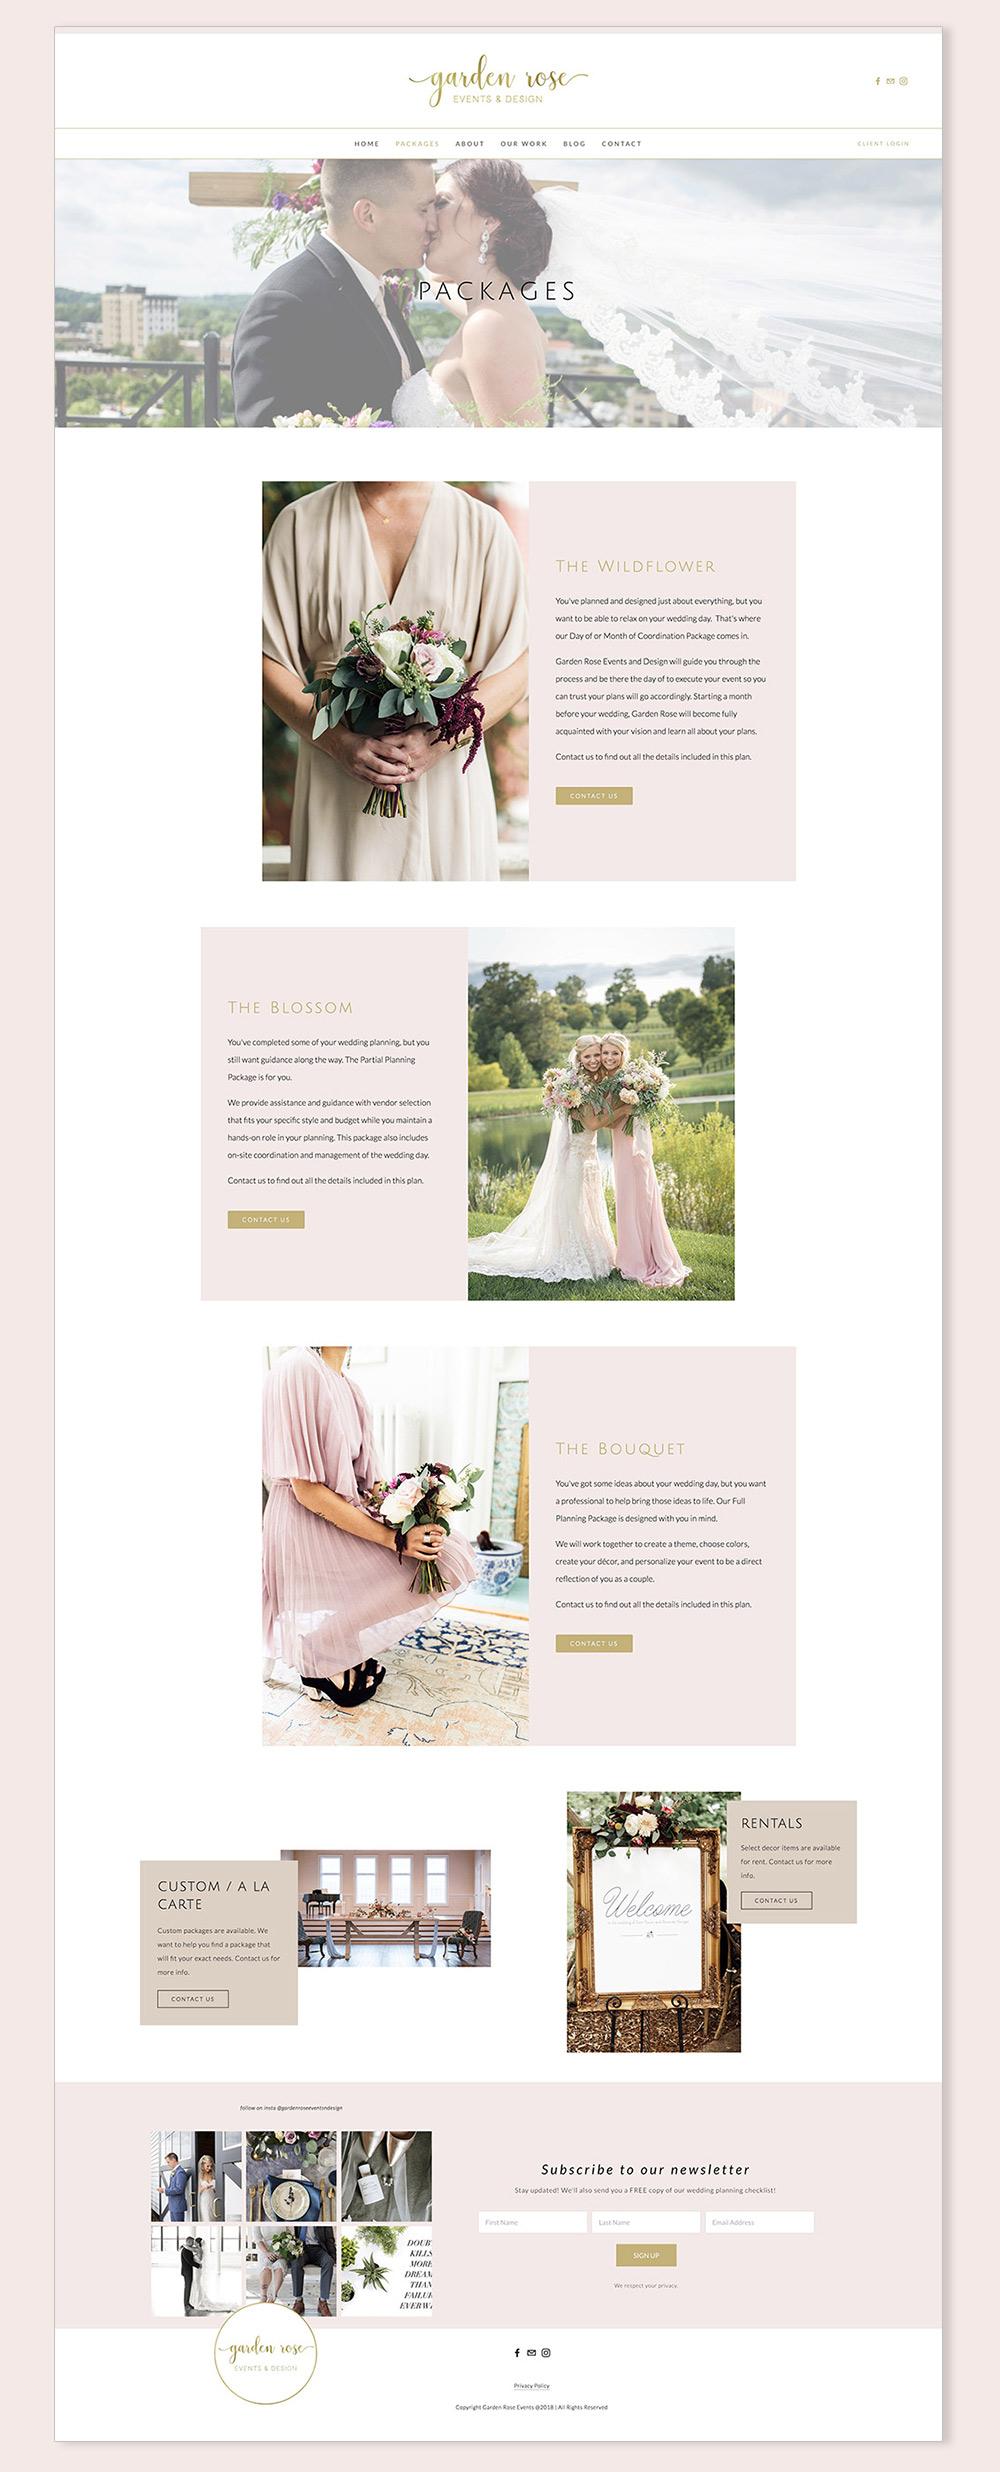 Packages page | Garden Rose Events & Design website | Squarespace web design by Jodi Neufeld Design